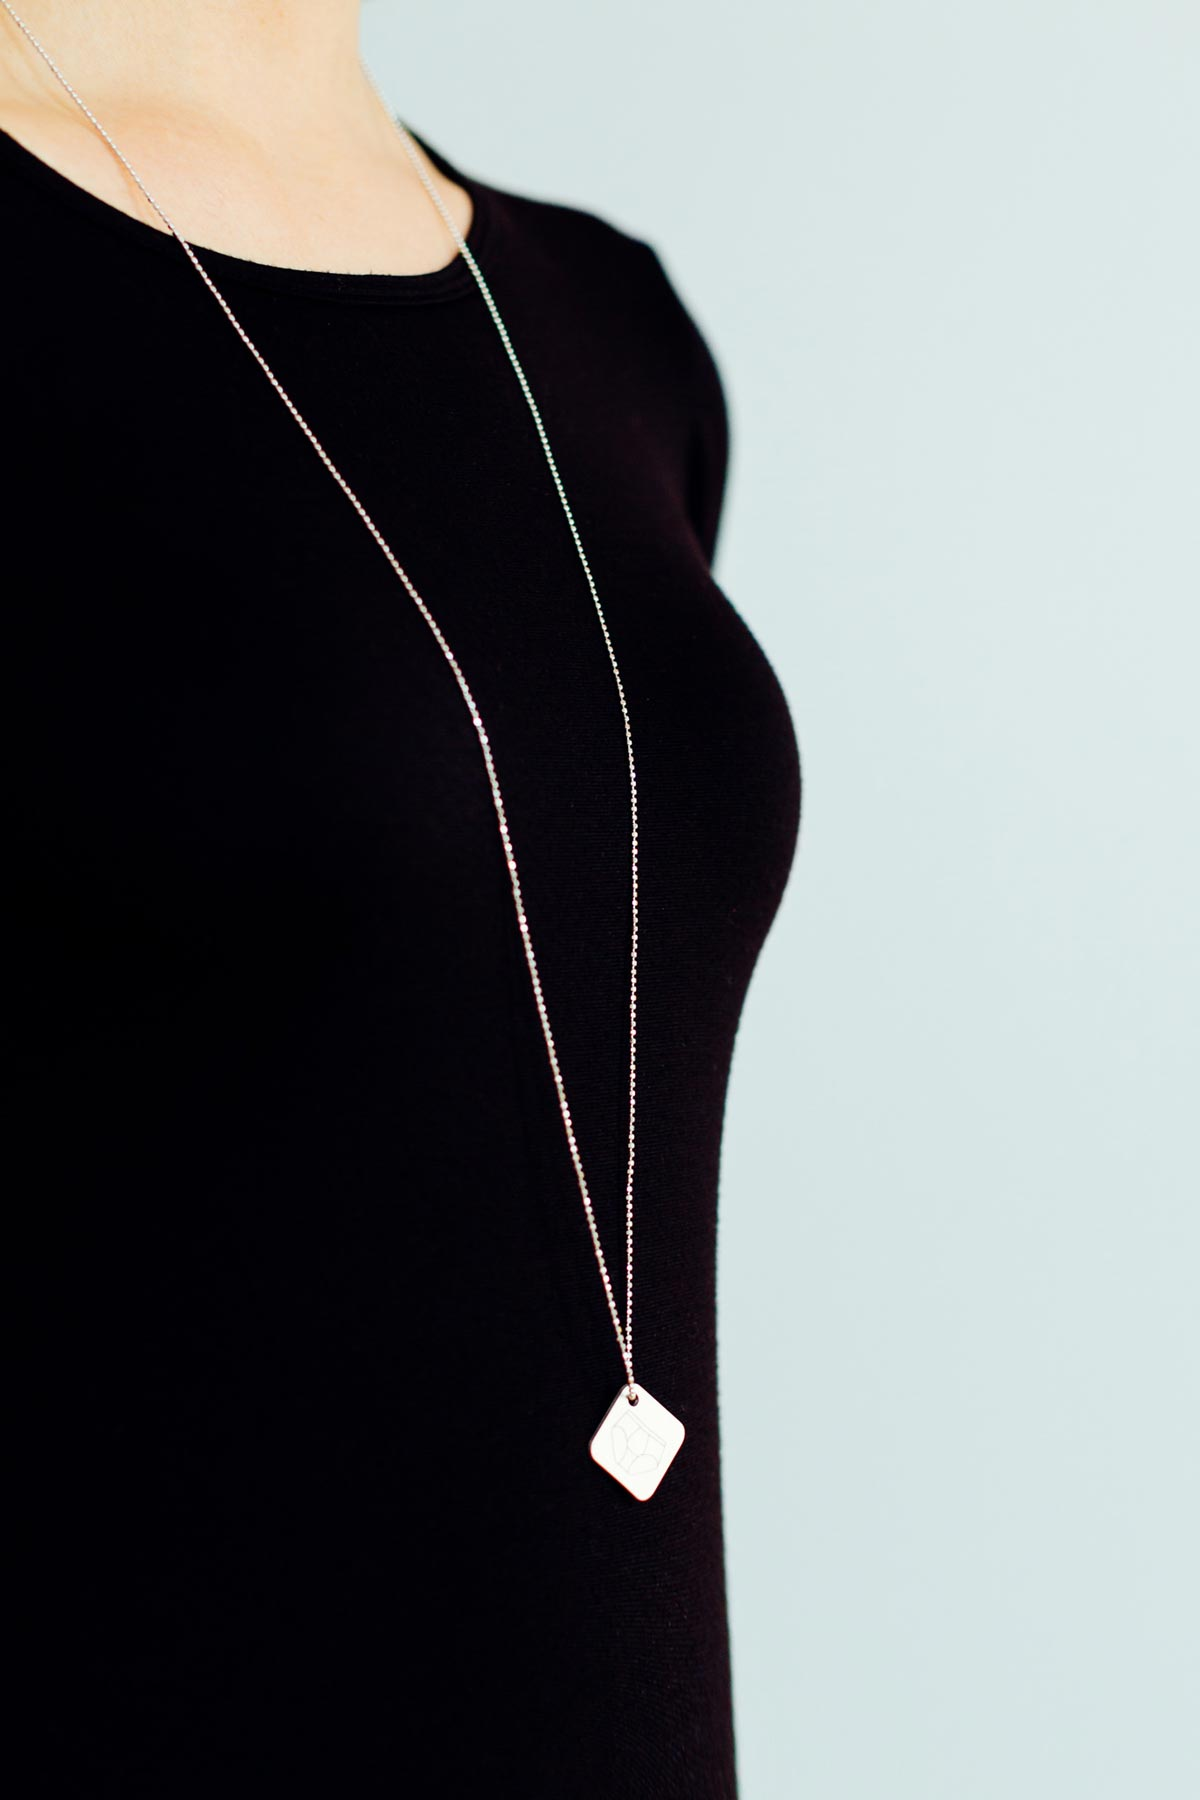 maria michael onnerboegs fashion menswear jewelry necklace plexiglas acrylglas portfolio work